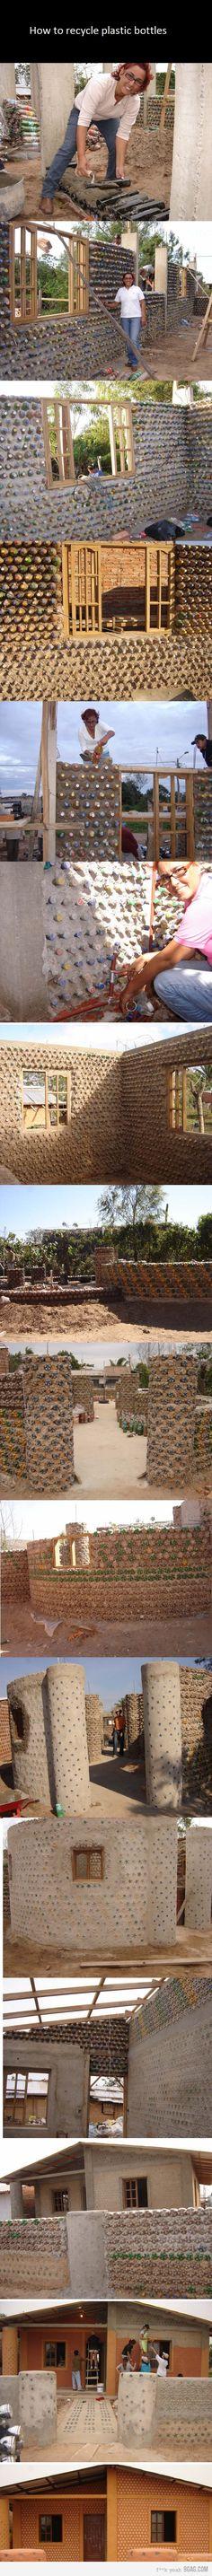 houses, plastic bottles, recycling, garden walls, house building, recycled bottles, buildings, wine bottles, bolivia